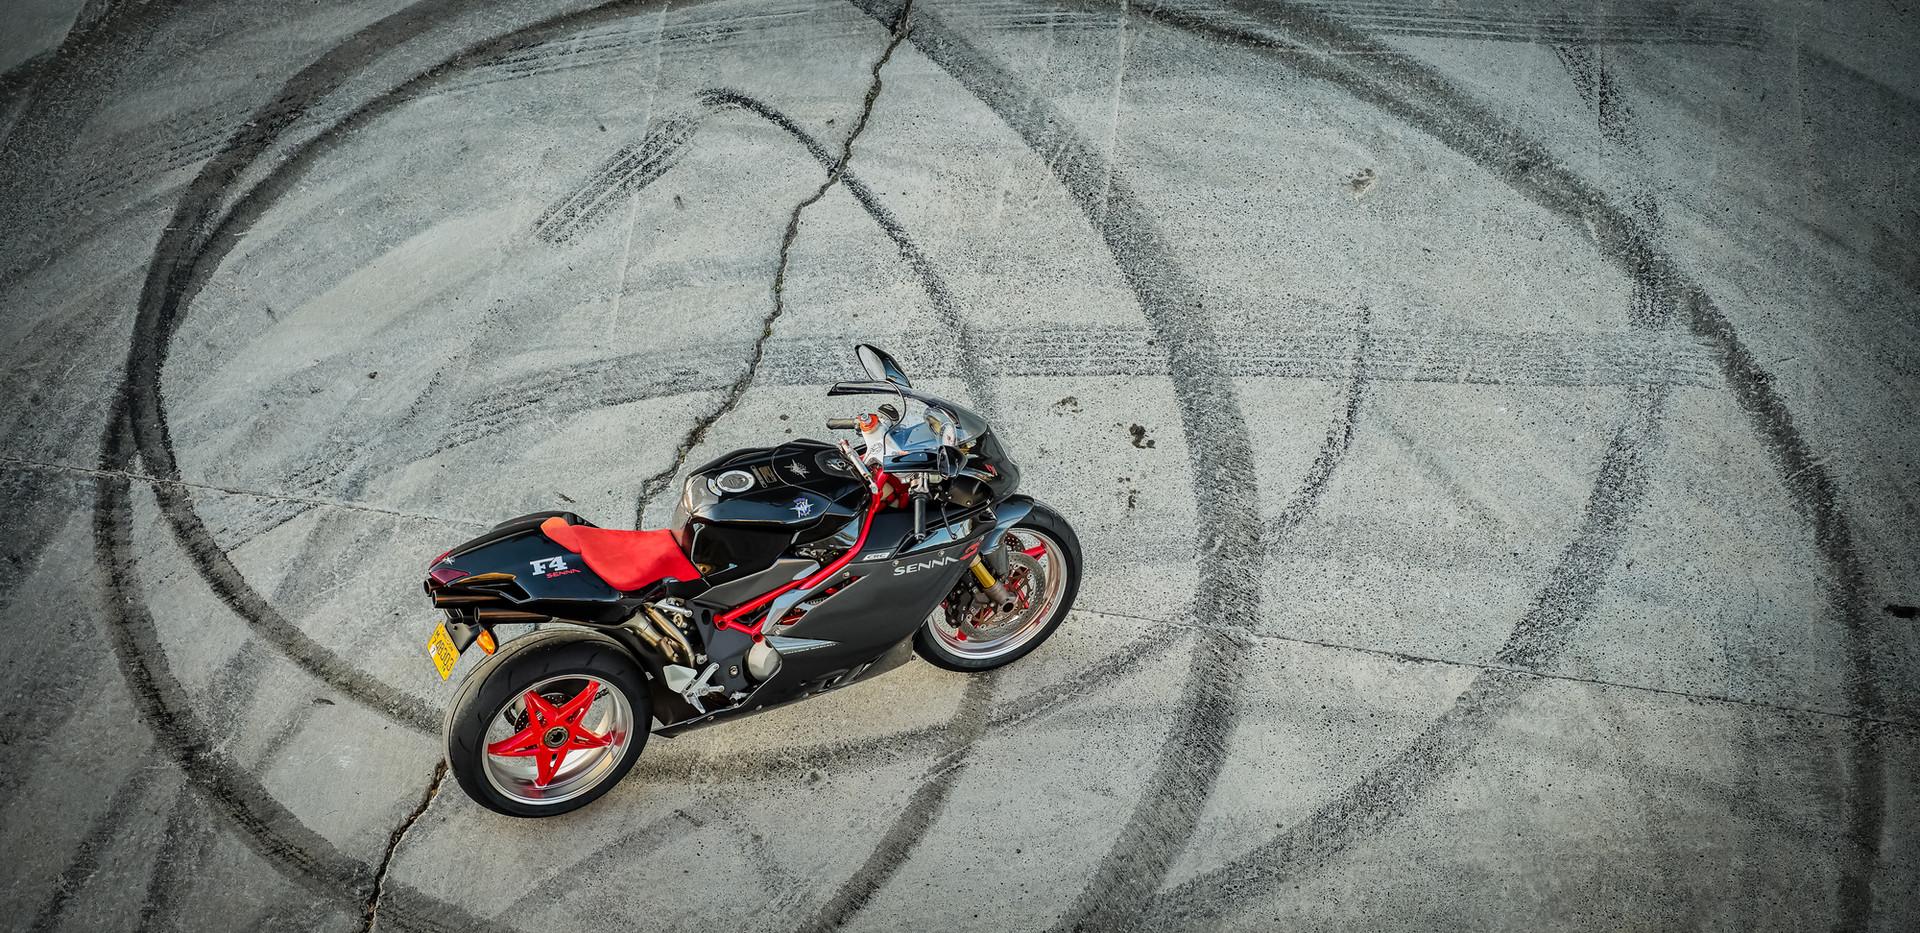 The Image Engine MV Agusta Senna